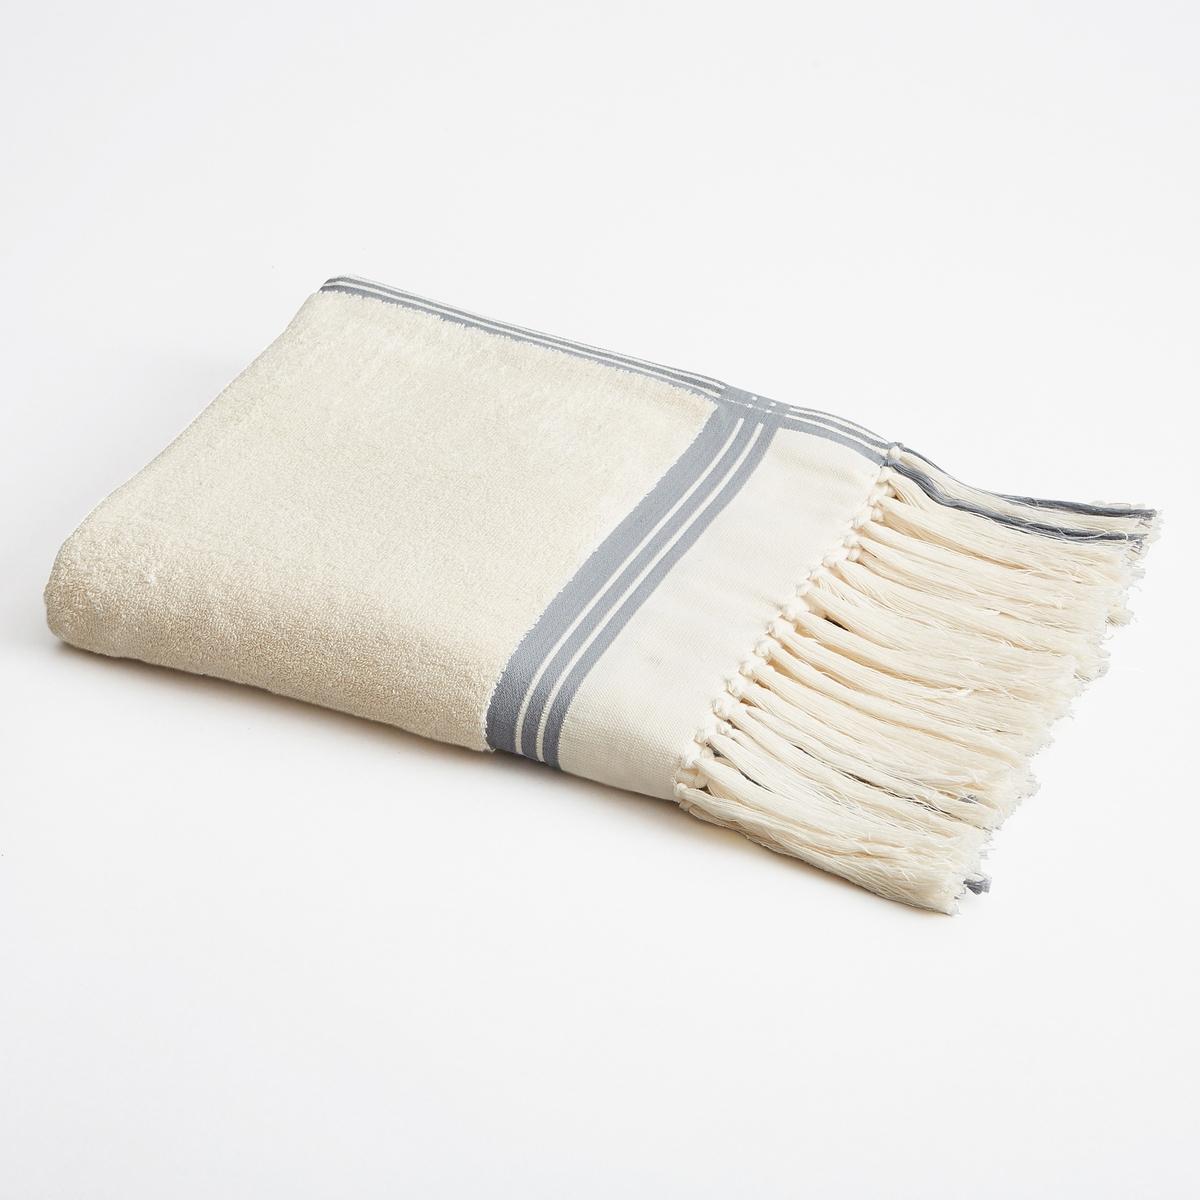 Полотенце банное формата макси Gamacha By V. Barkowski